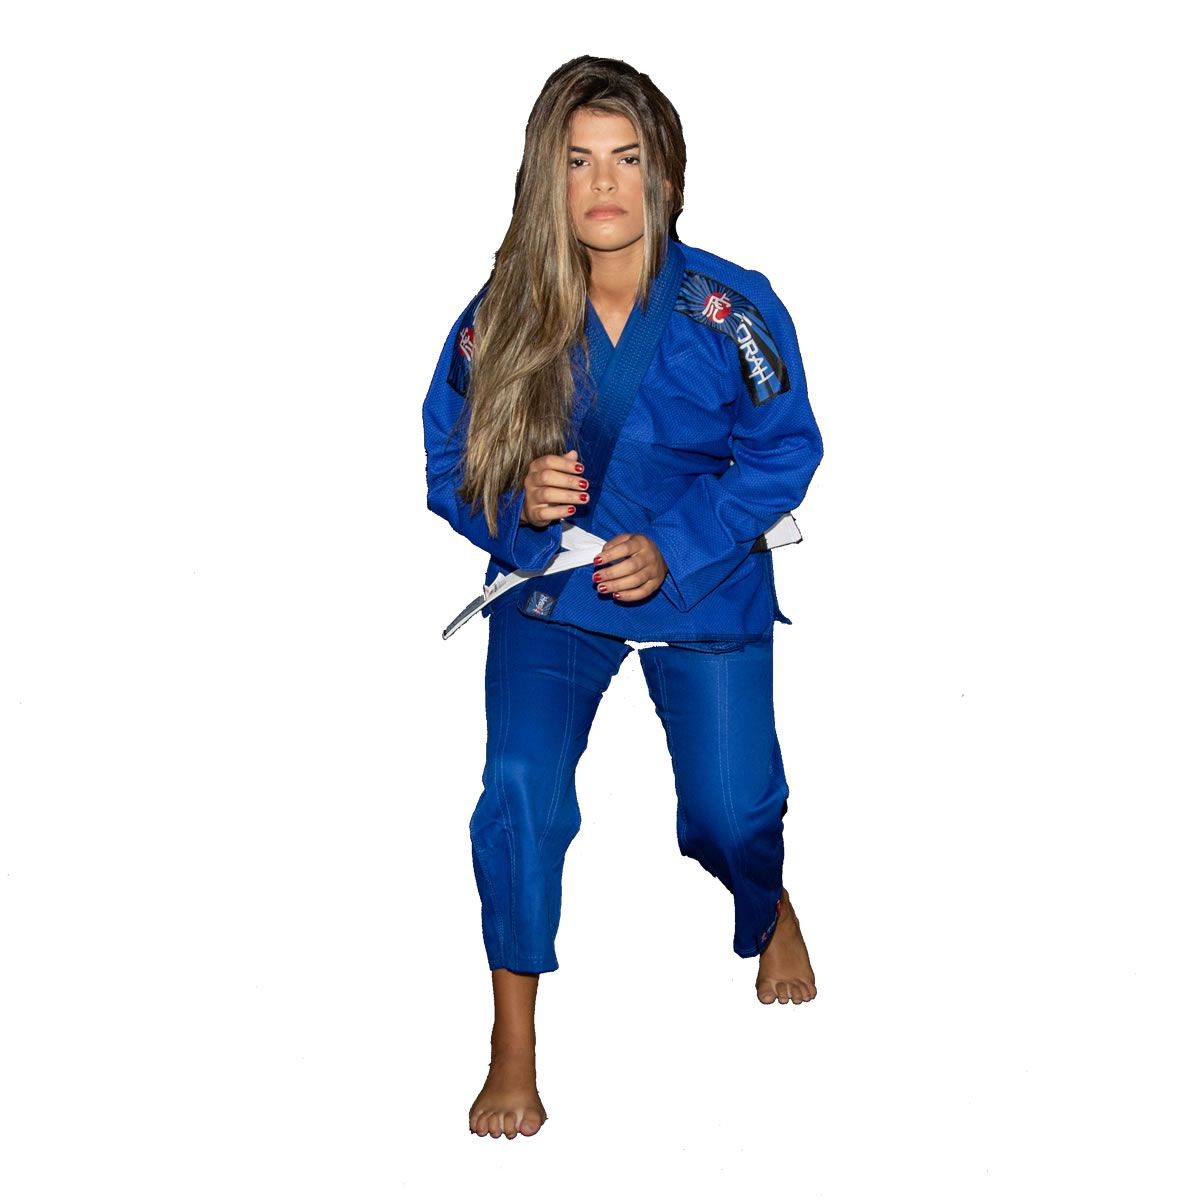 Kimono Jiu Jitsu Trançado Flex - Adulto - Azul - Unissex - Torah  - Loja do Competidor